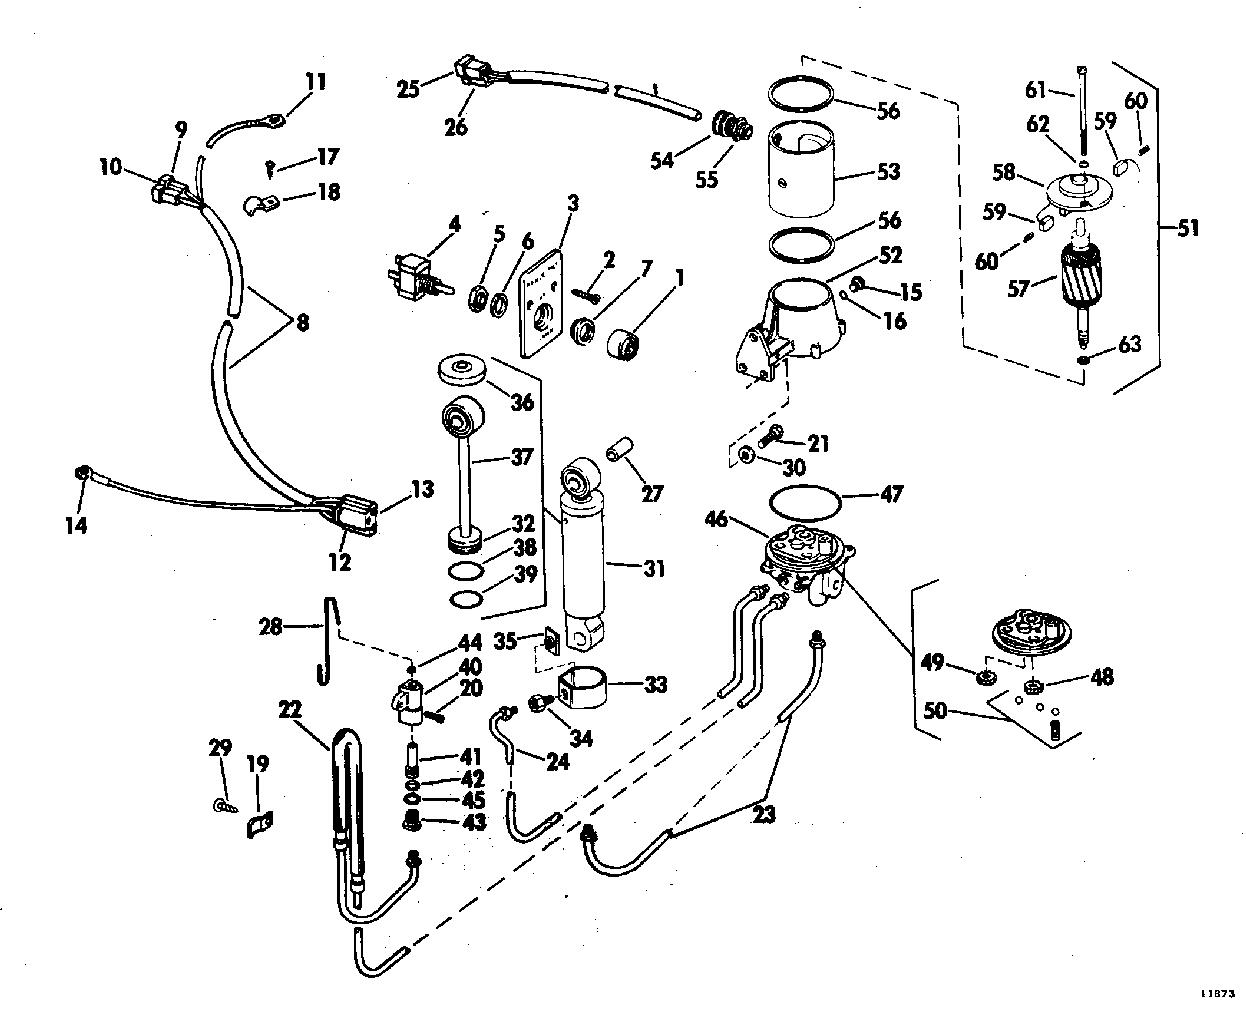 yamaha boat dual battery wiring diagram